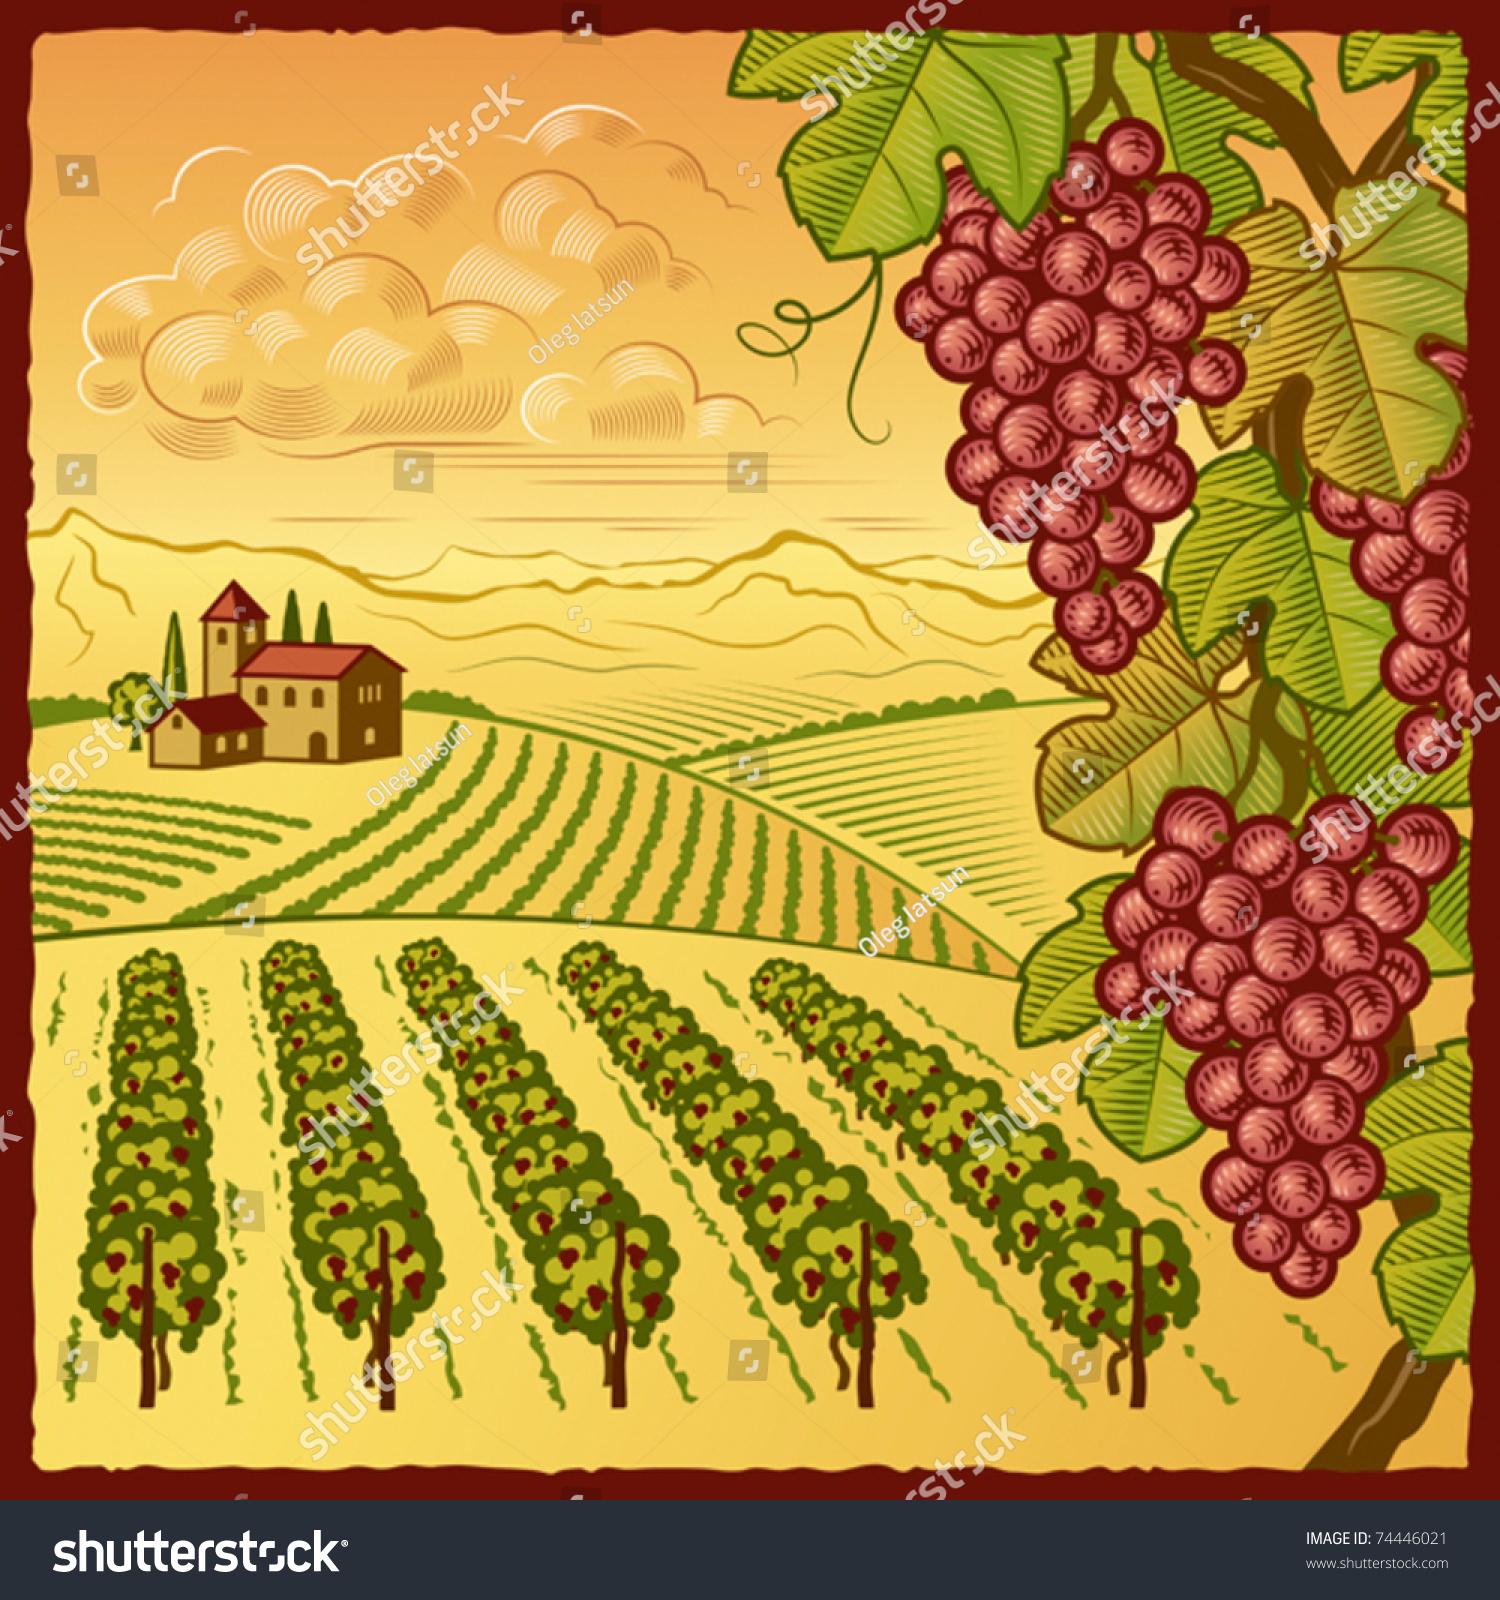 Vineyard Vectors, Photos and PSD files | Free Download